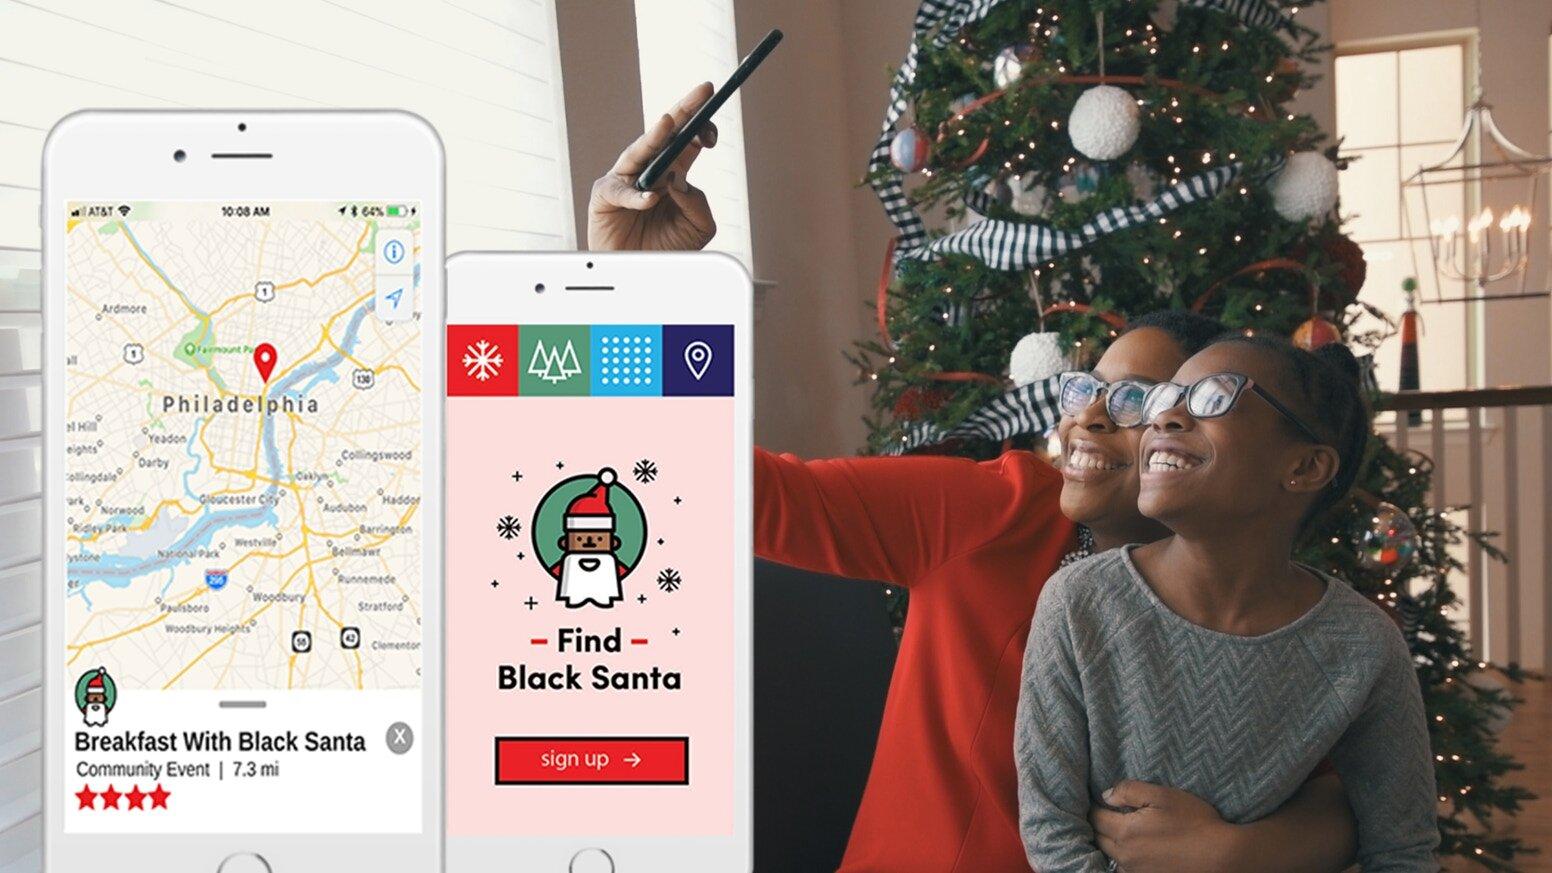 PC: Find Black Santa Kickstarter